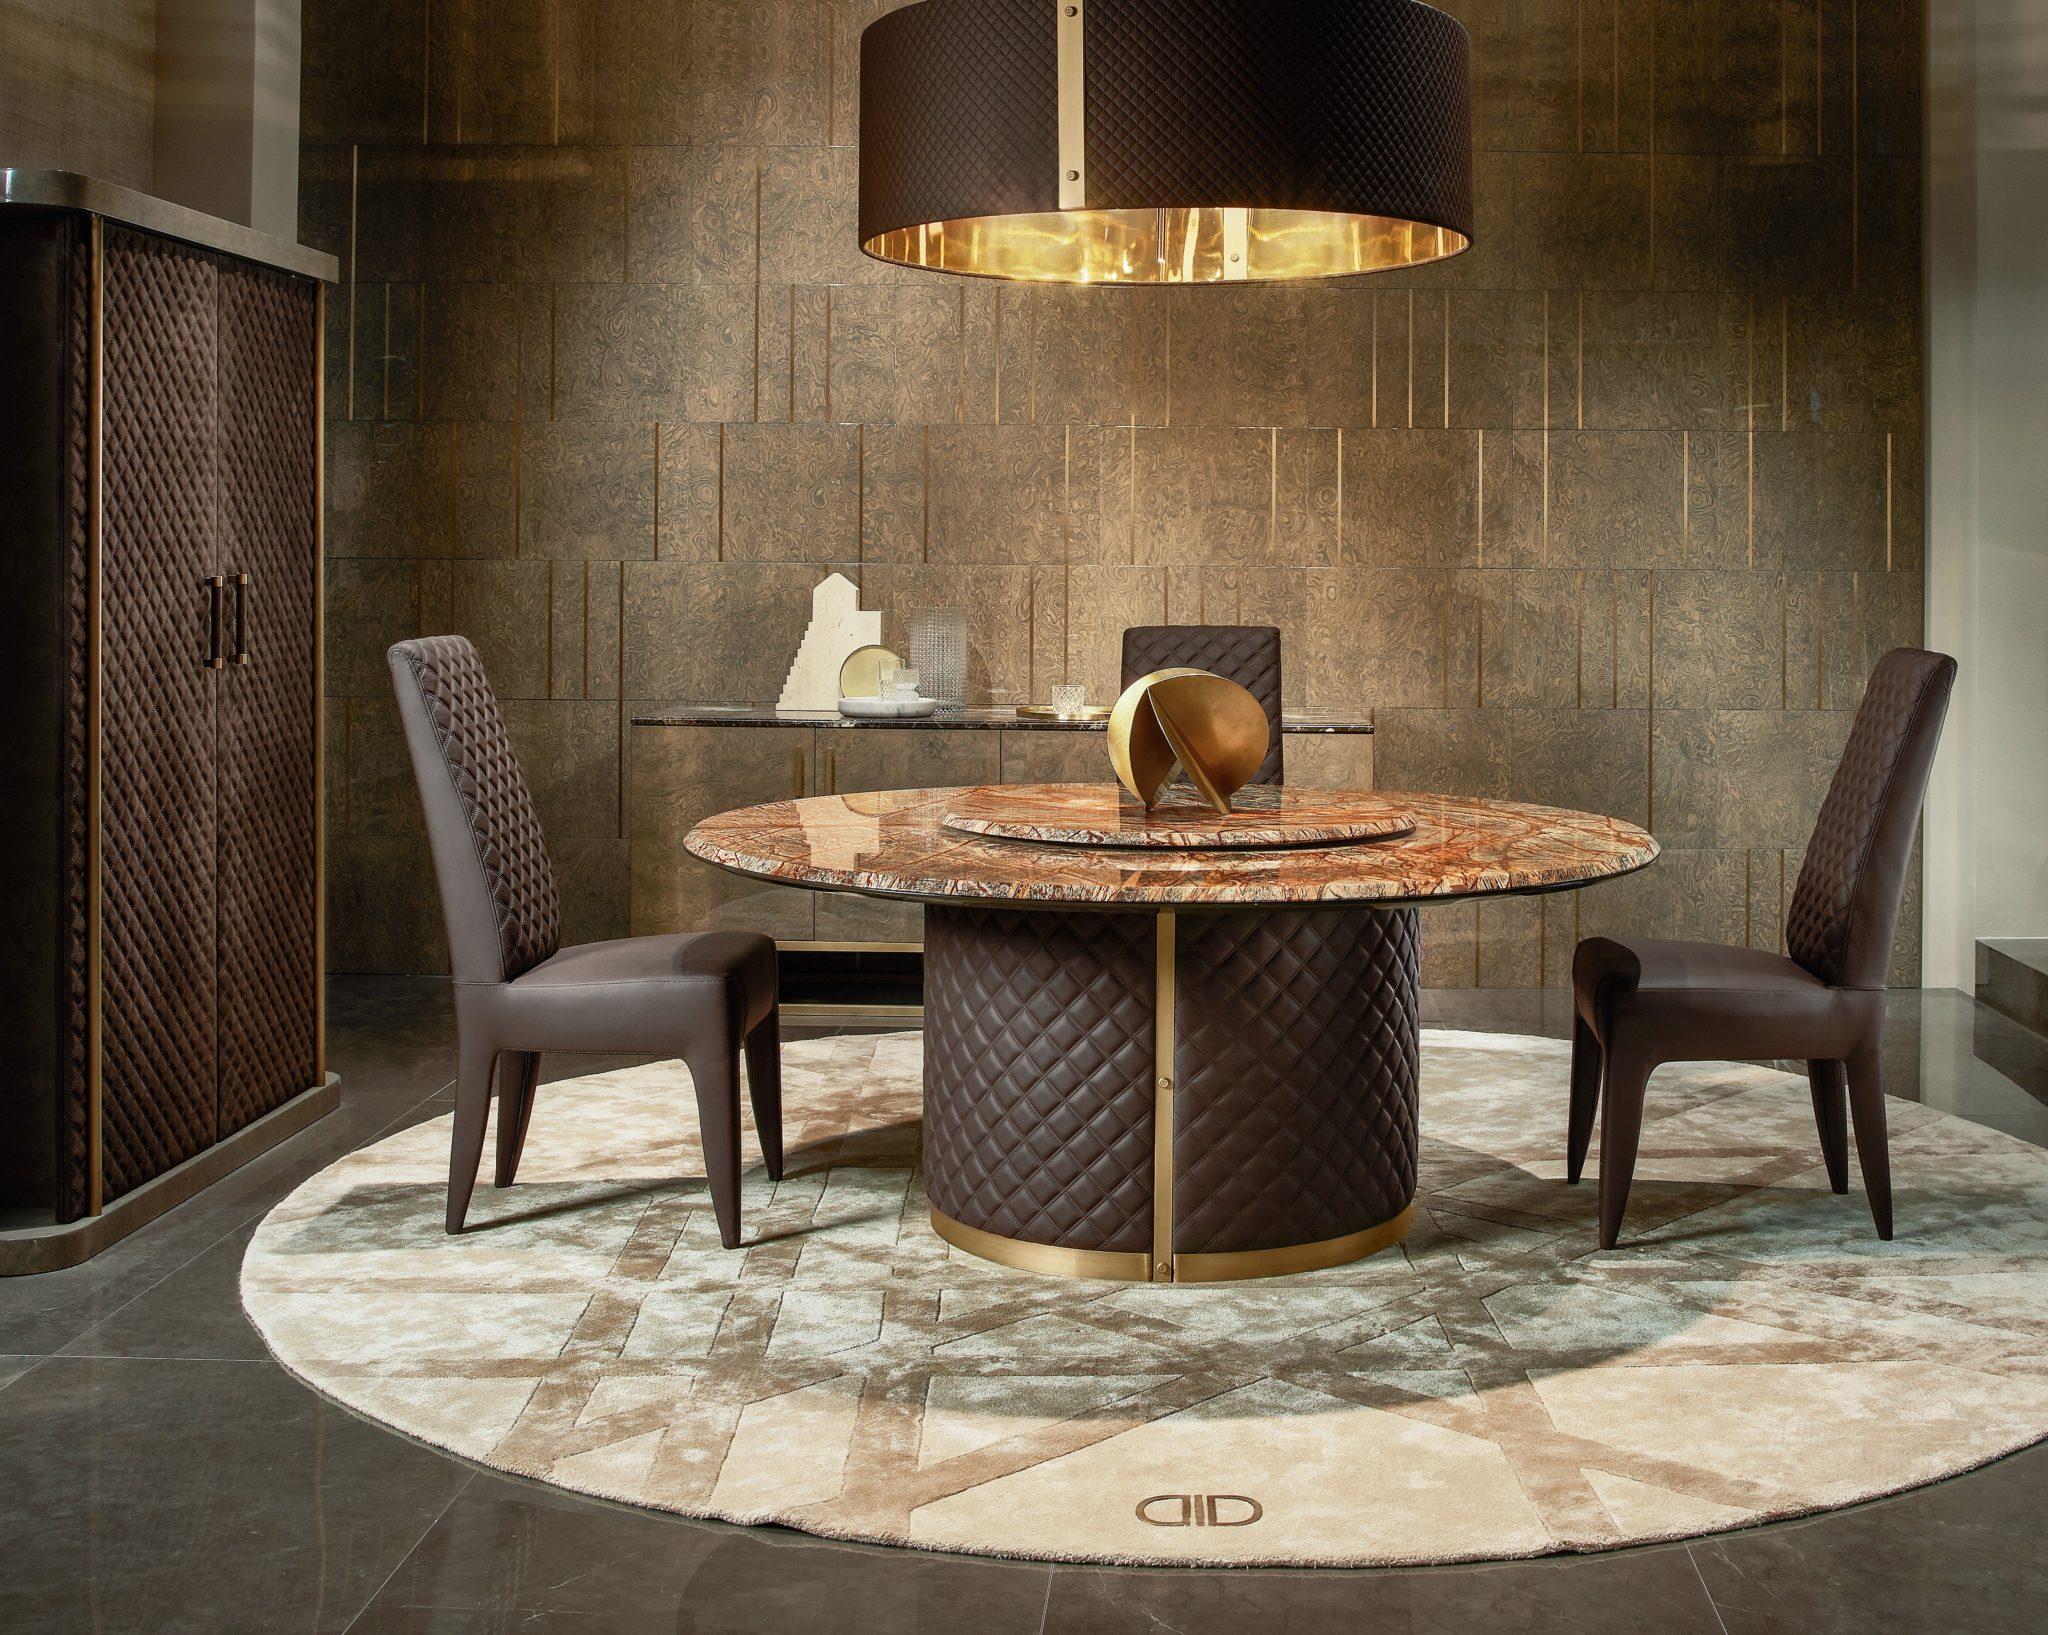 Nuovo showroom Daytona, luxury brand by Signorini & Coco, a Milano ...